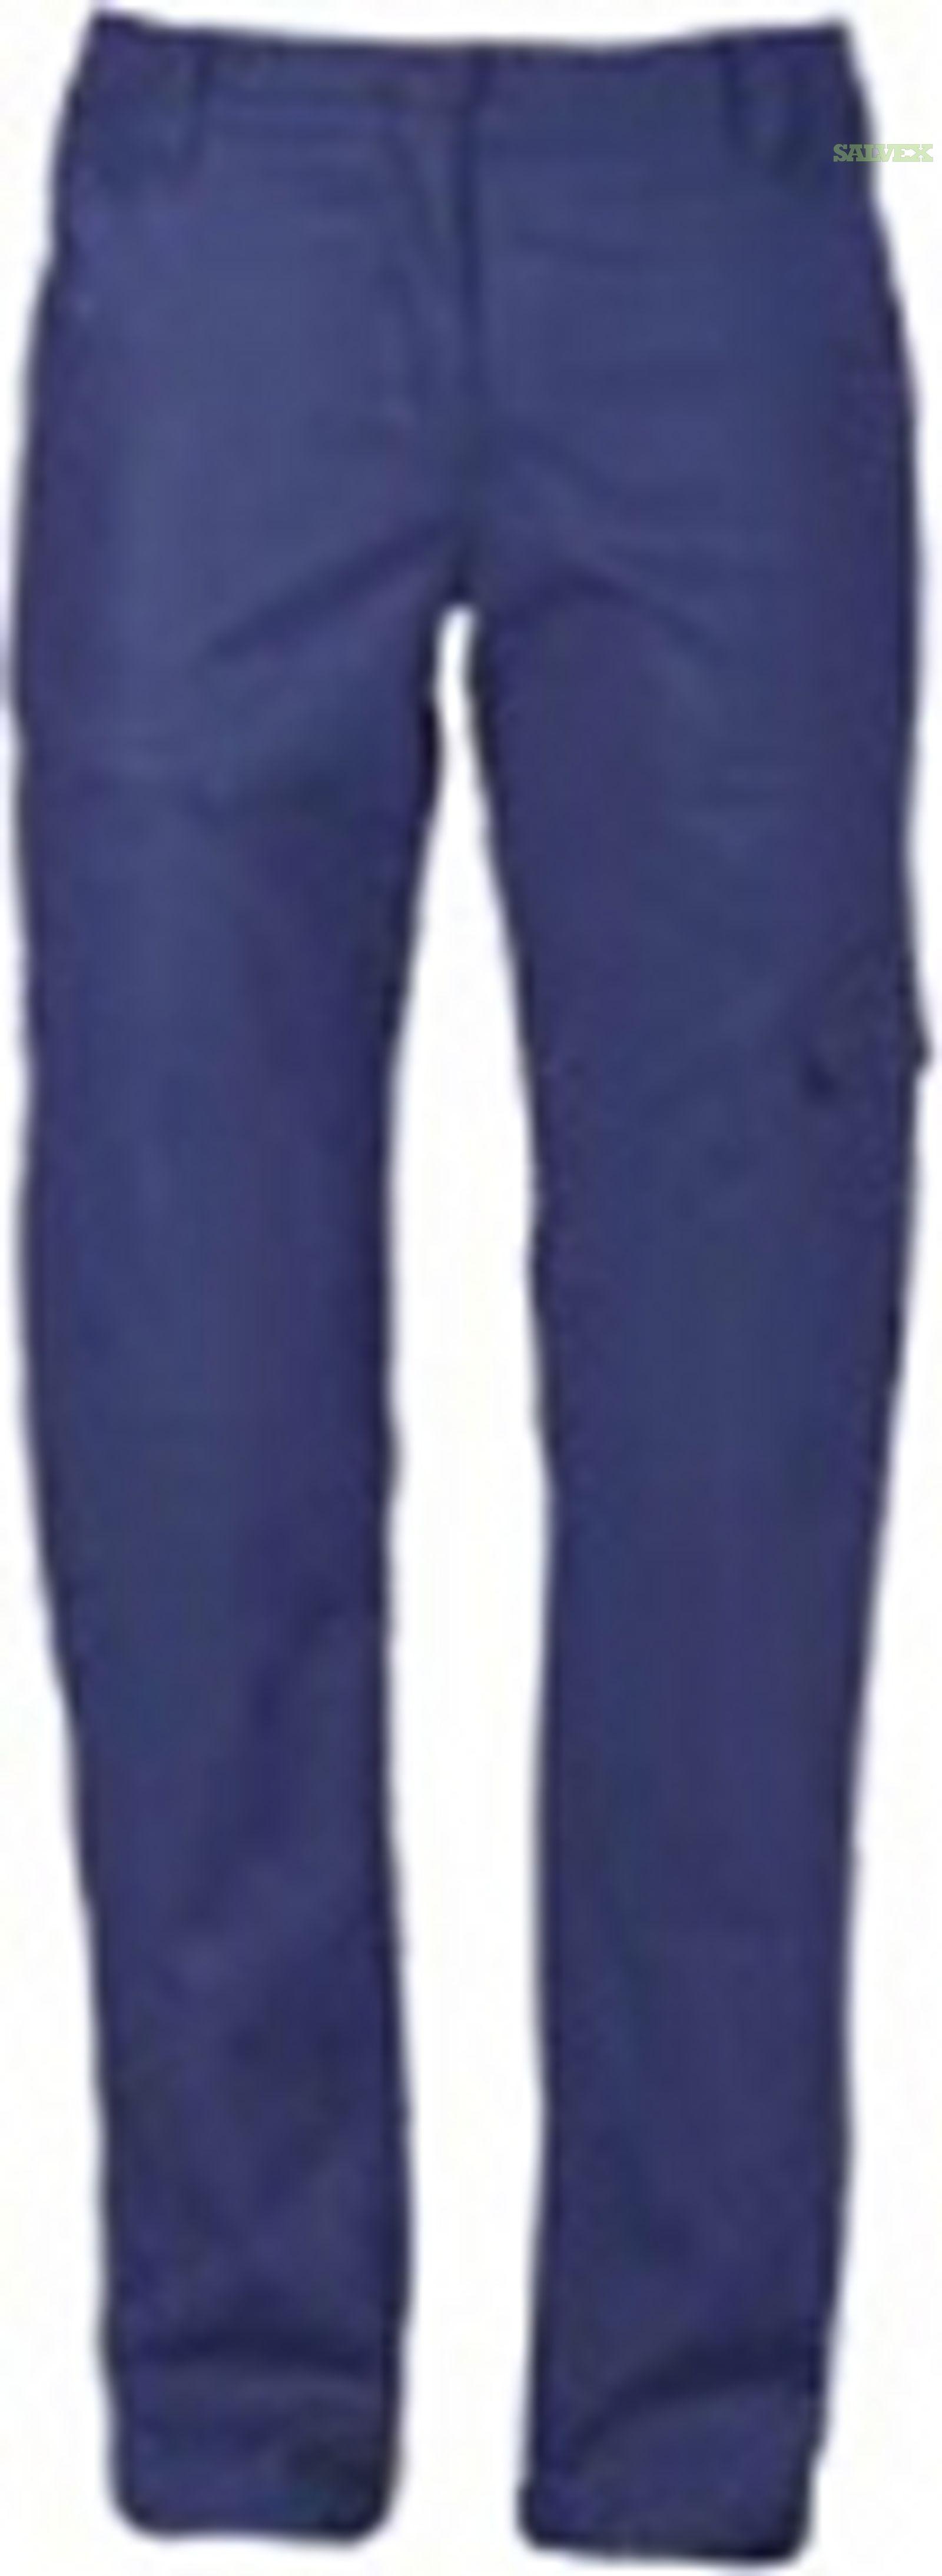 Jonsson Protective Garments (14,500 Items)